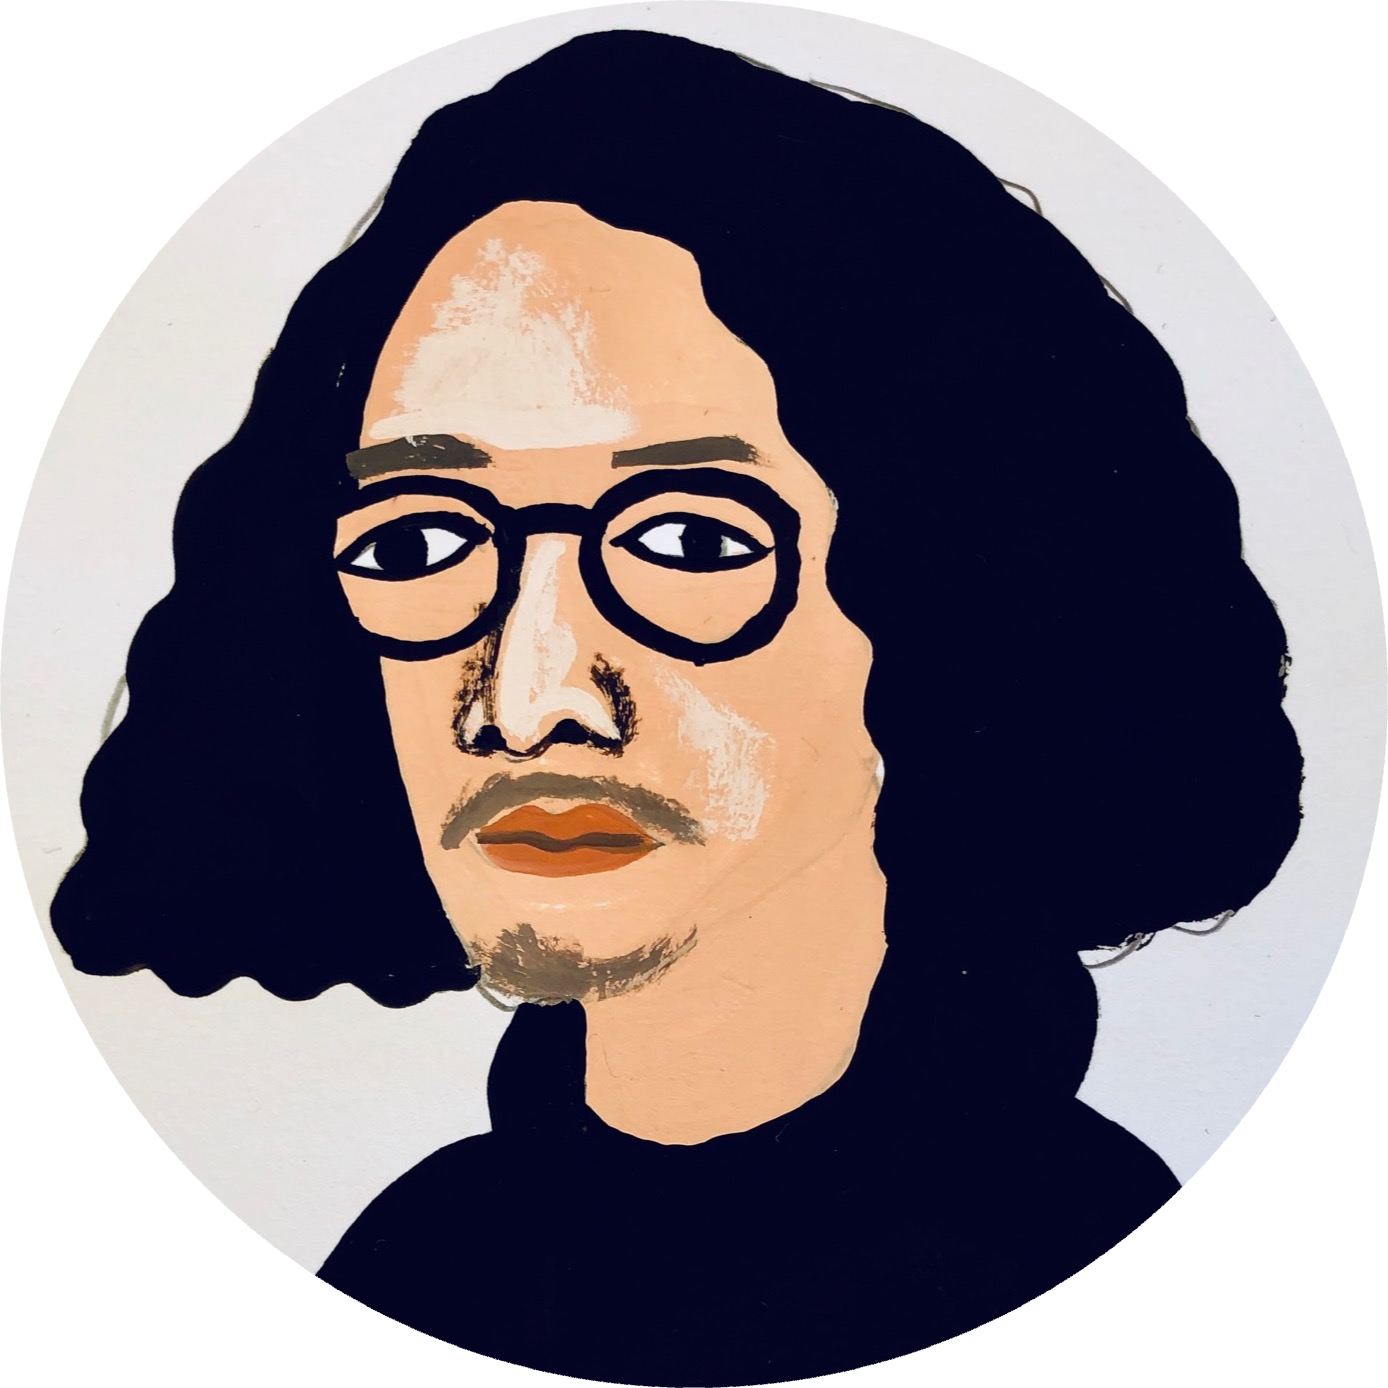 @yuacme Profile Image | Linktree